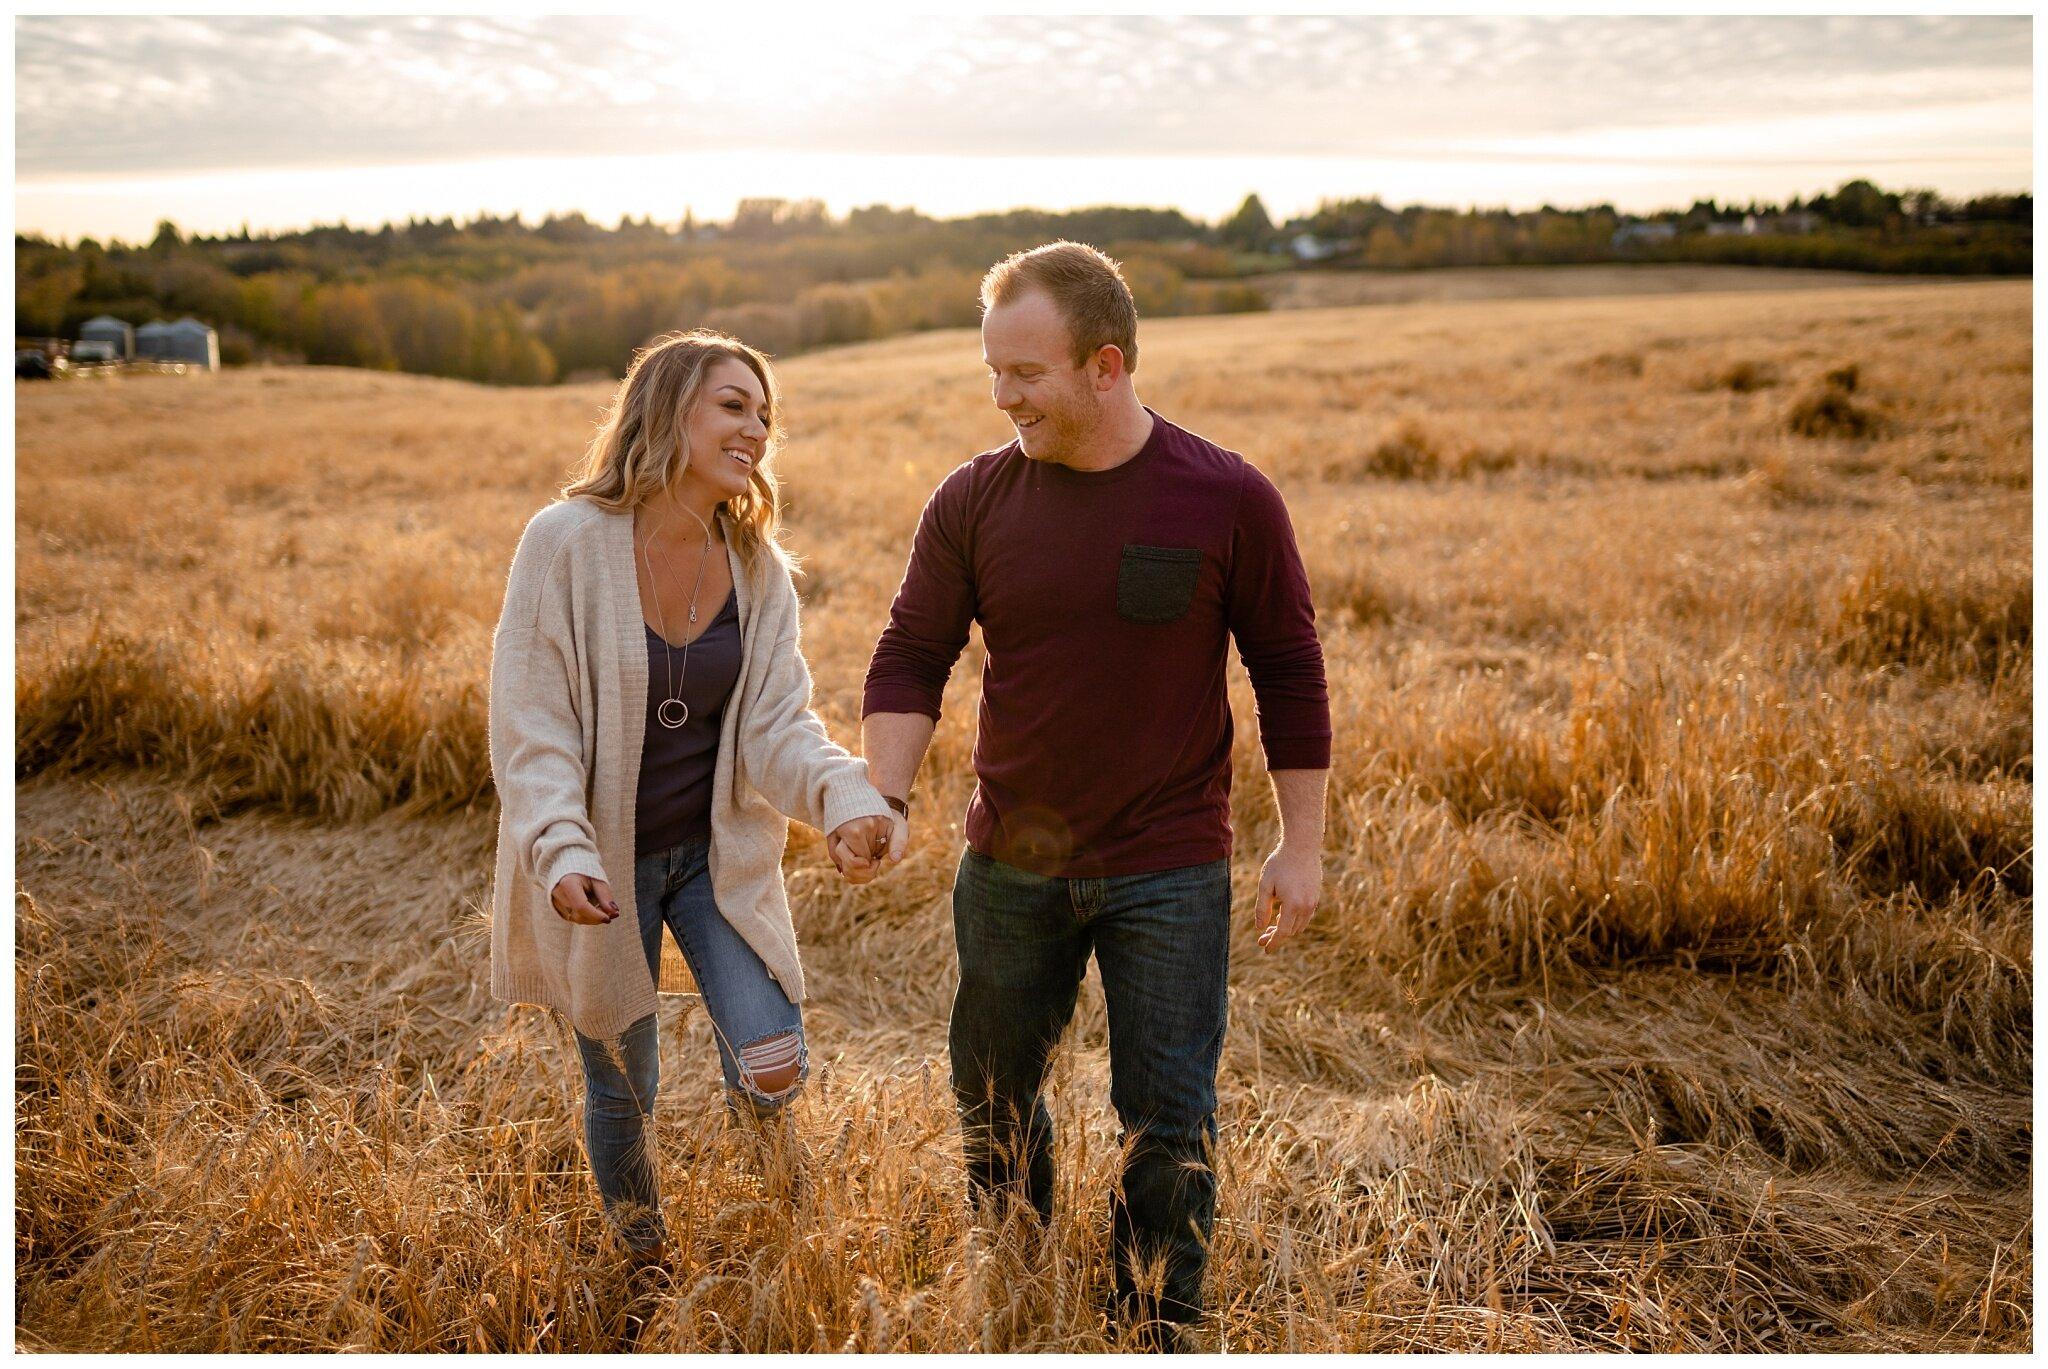 Edmonton Engagement Photographer Romantic Couples Photos Local YEG Strathcona County_0006.jpg